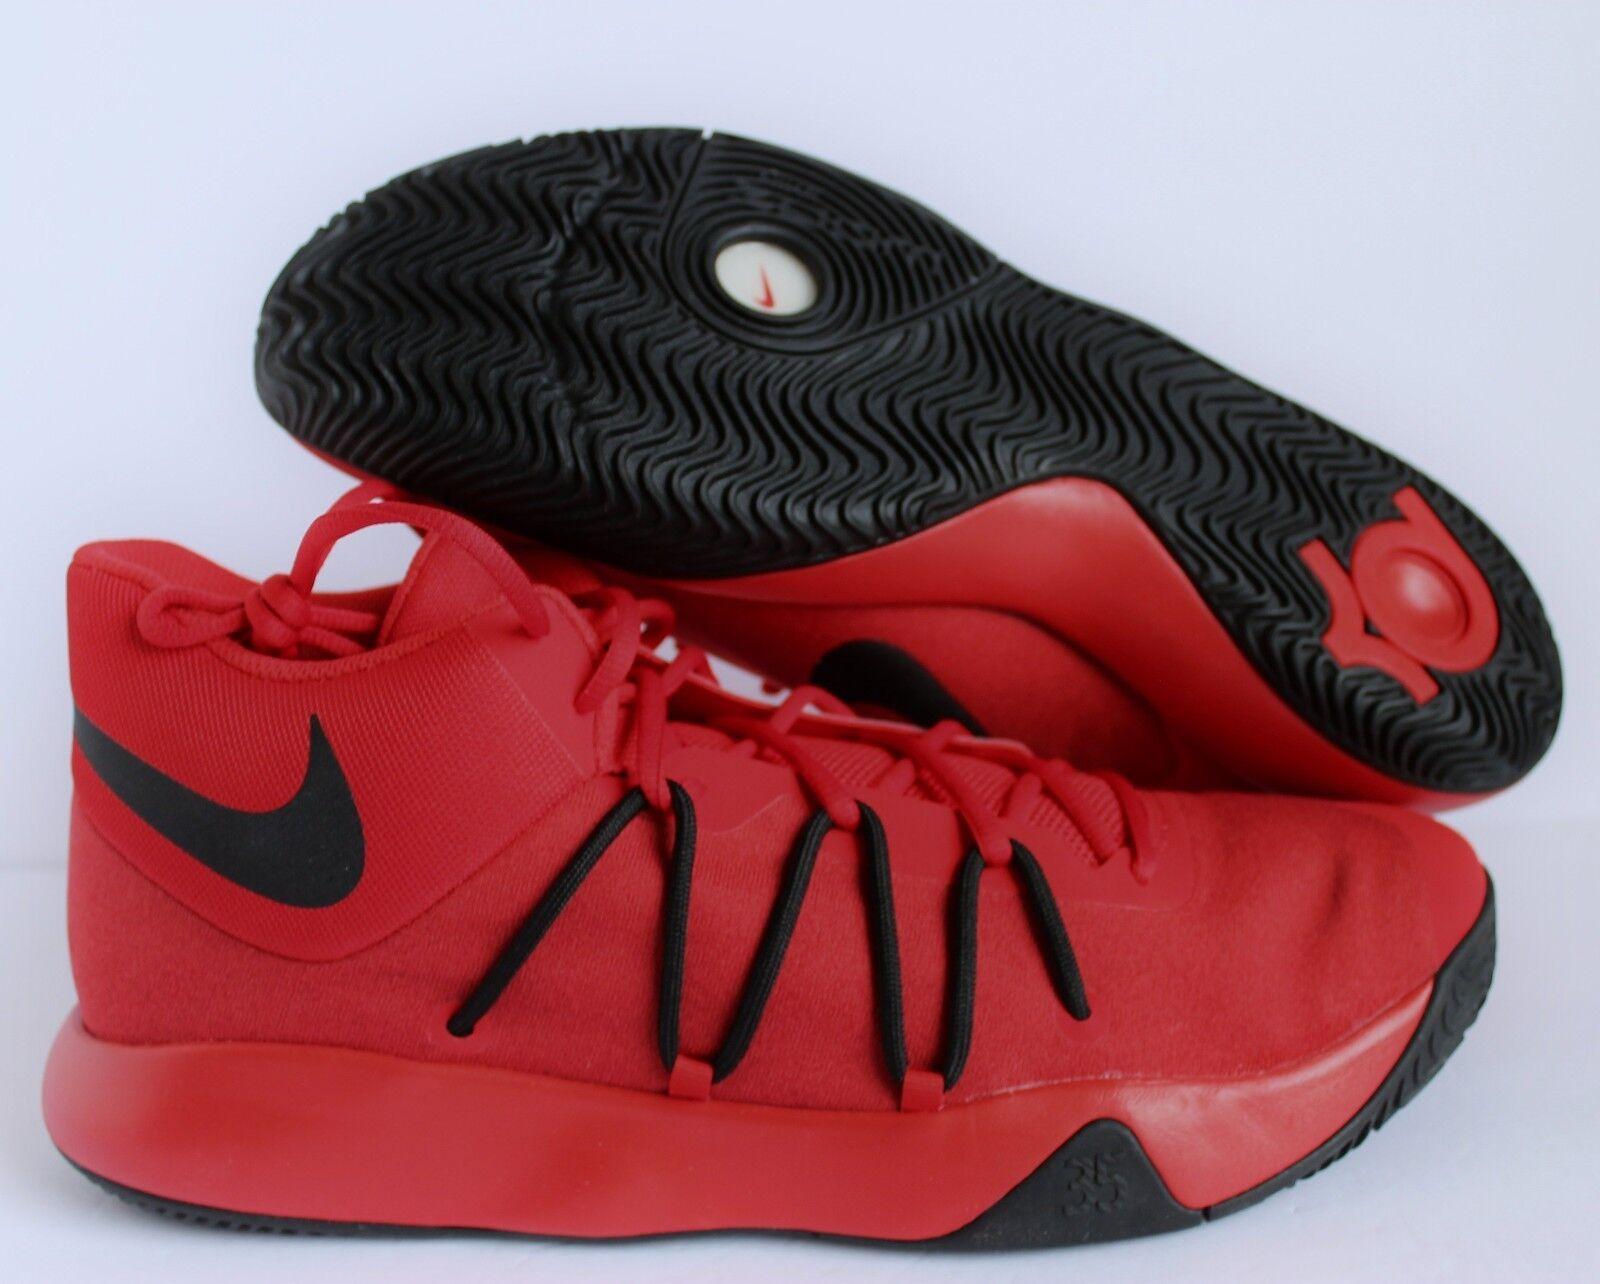 Nike kd red-nero-gym - 5 v, universit red-nero-gym kd red sz 15 [897638-600] 0f4282